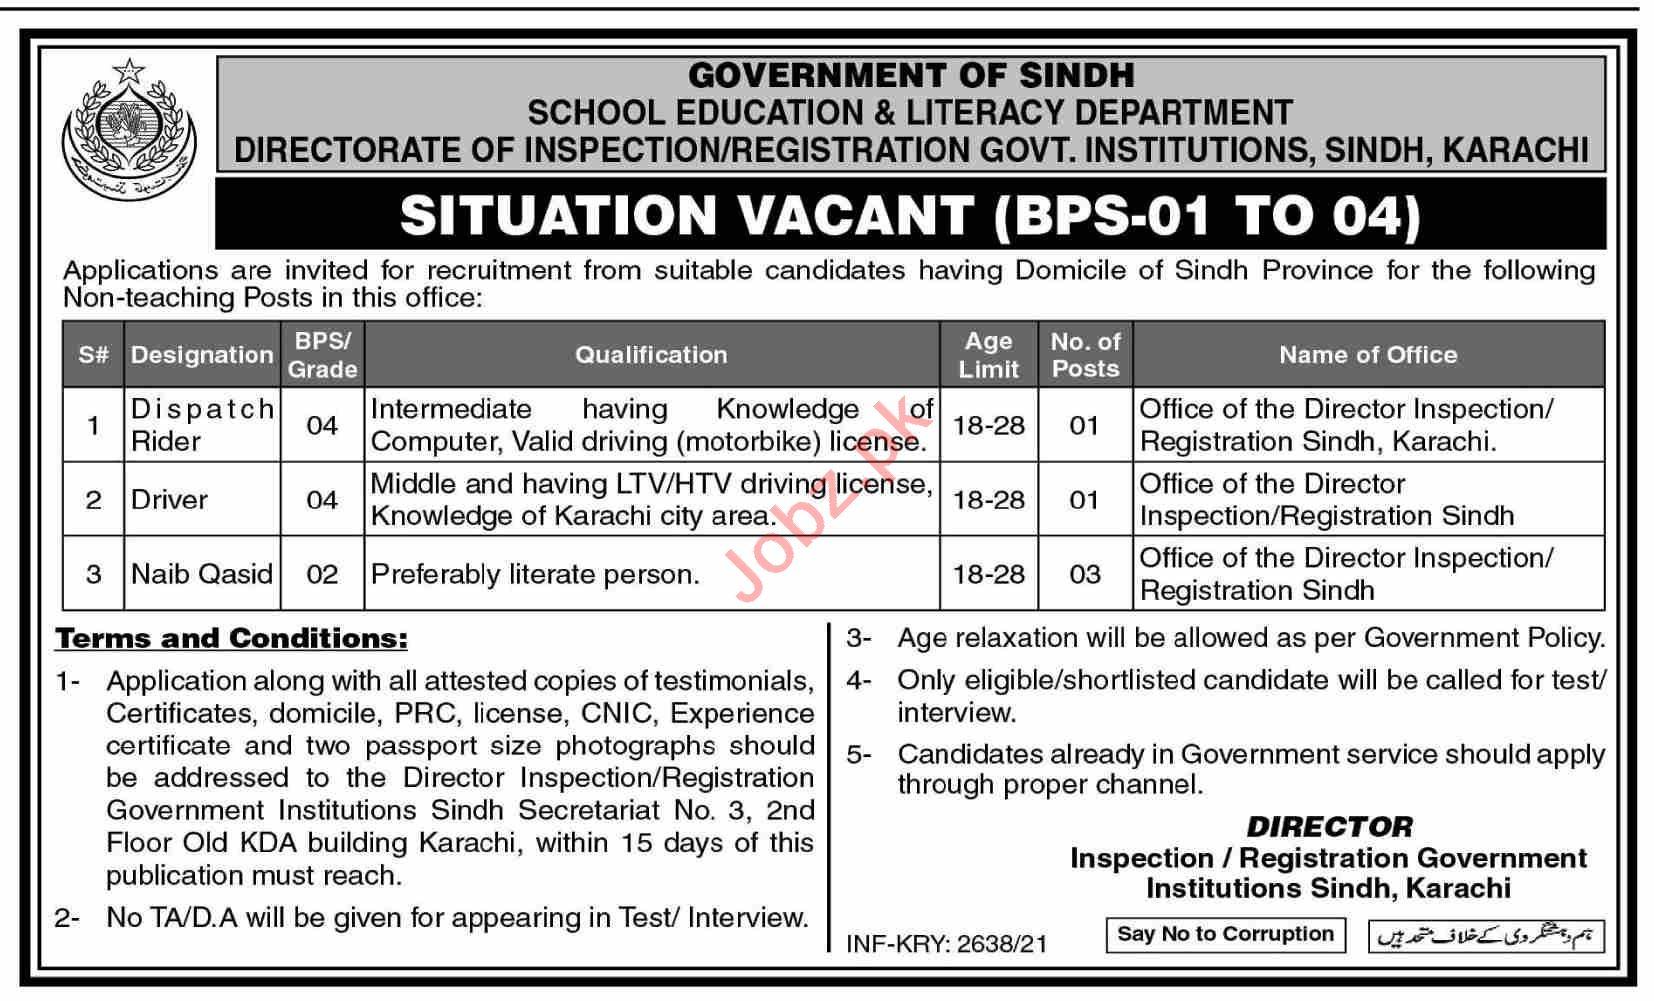 Directorate Inspection & Registration Govt Institutions Jobs